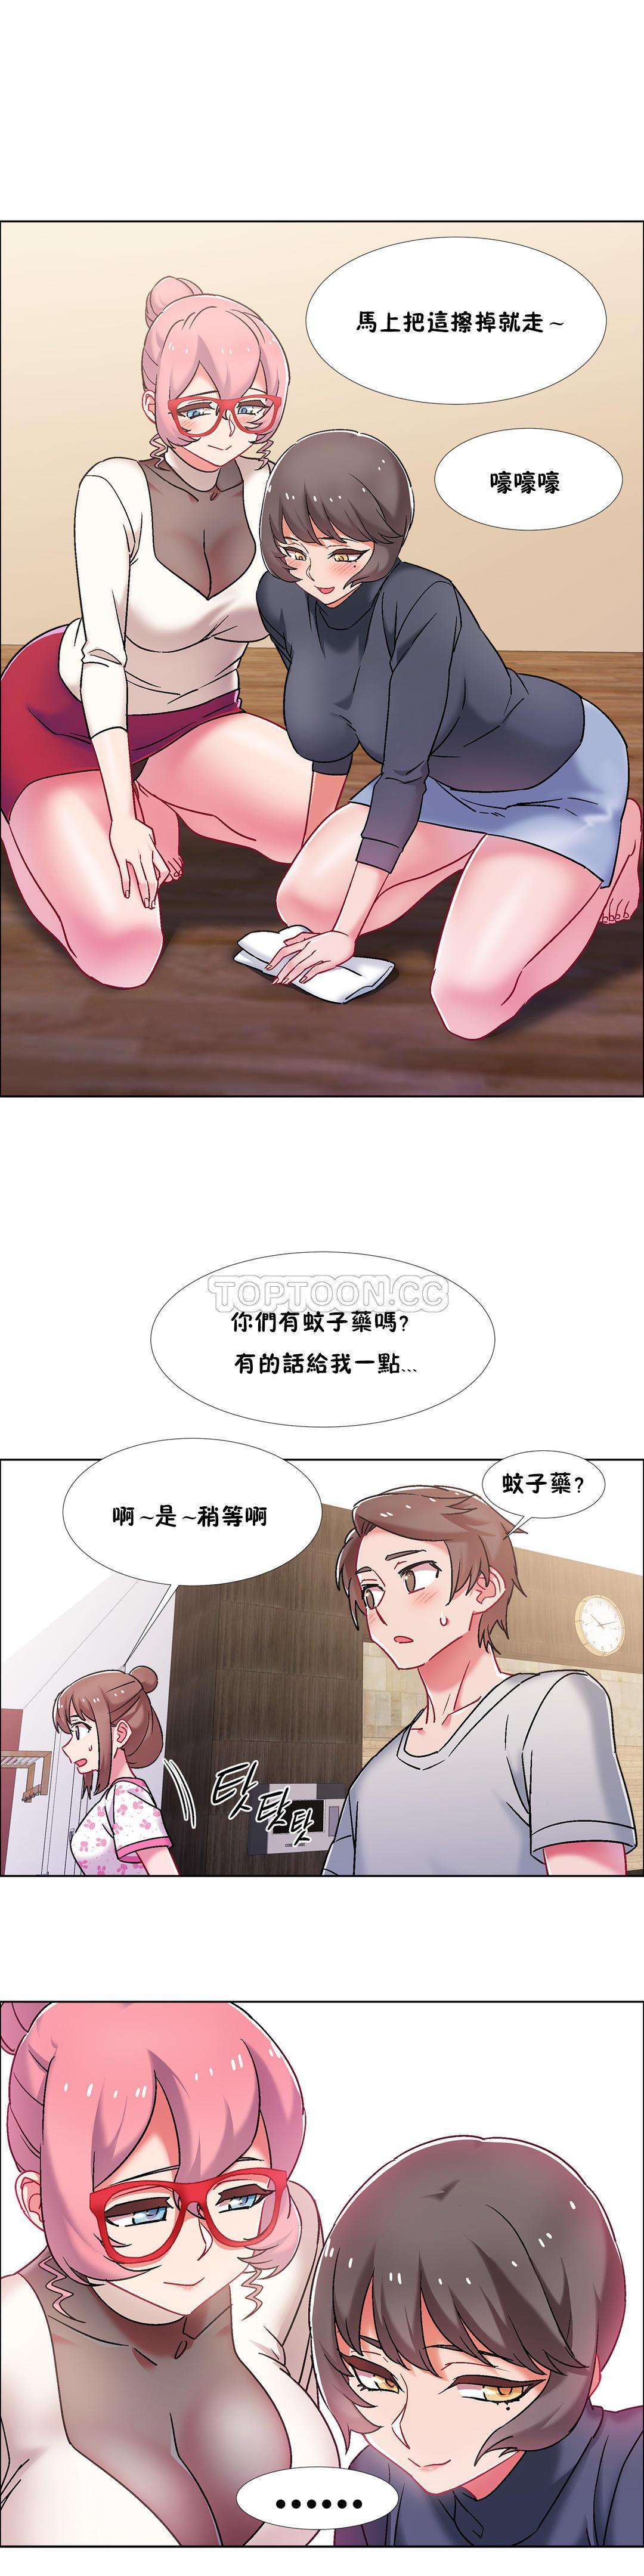 [Studio Wannabe] Rental Girls | 出租女郎 Ch. 33-58 [Chinese]  第二季 完结 253